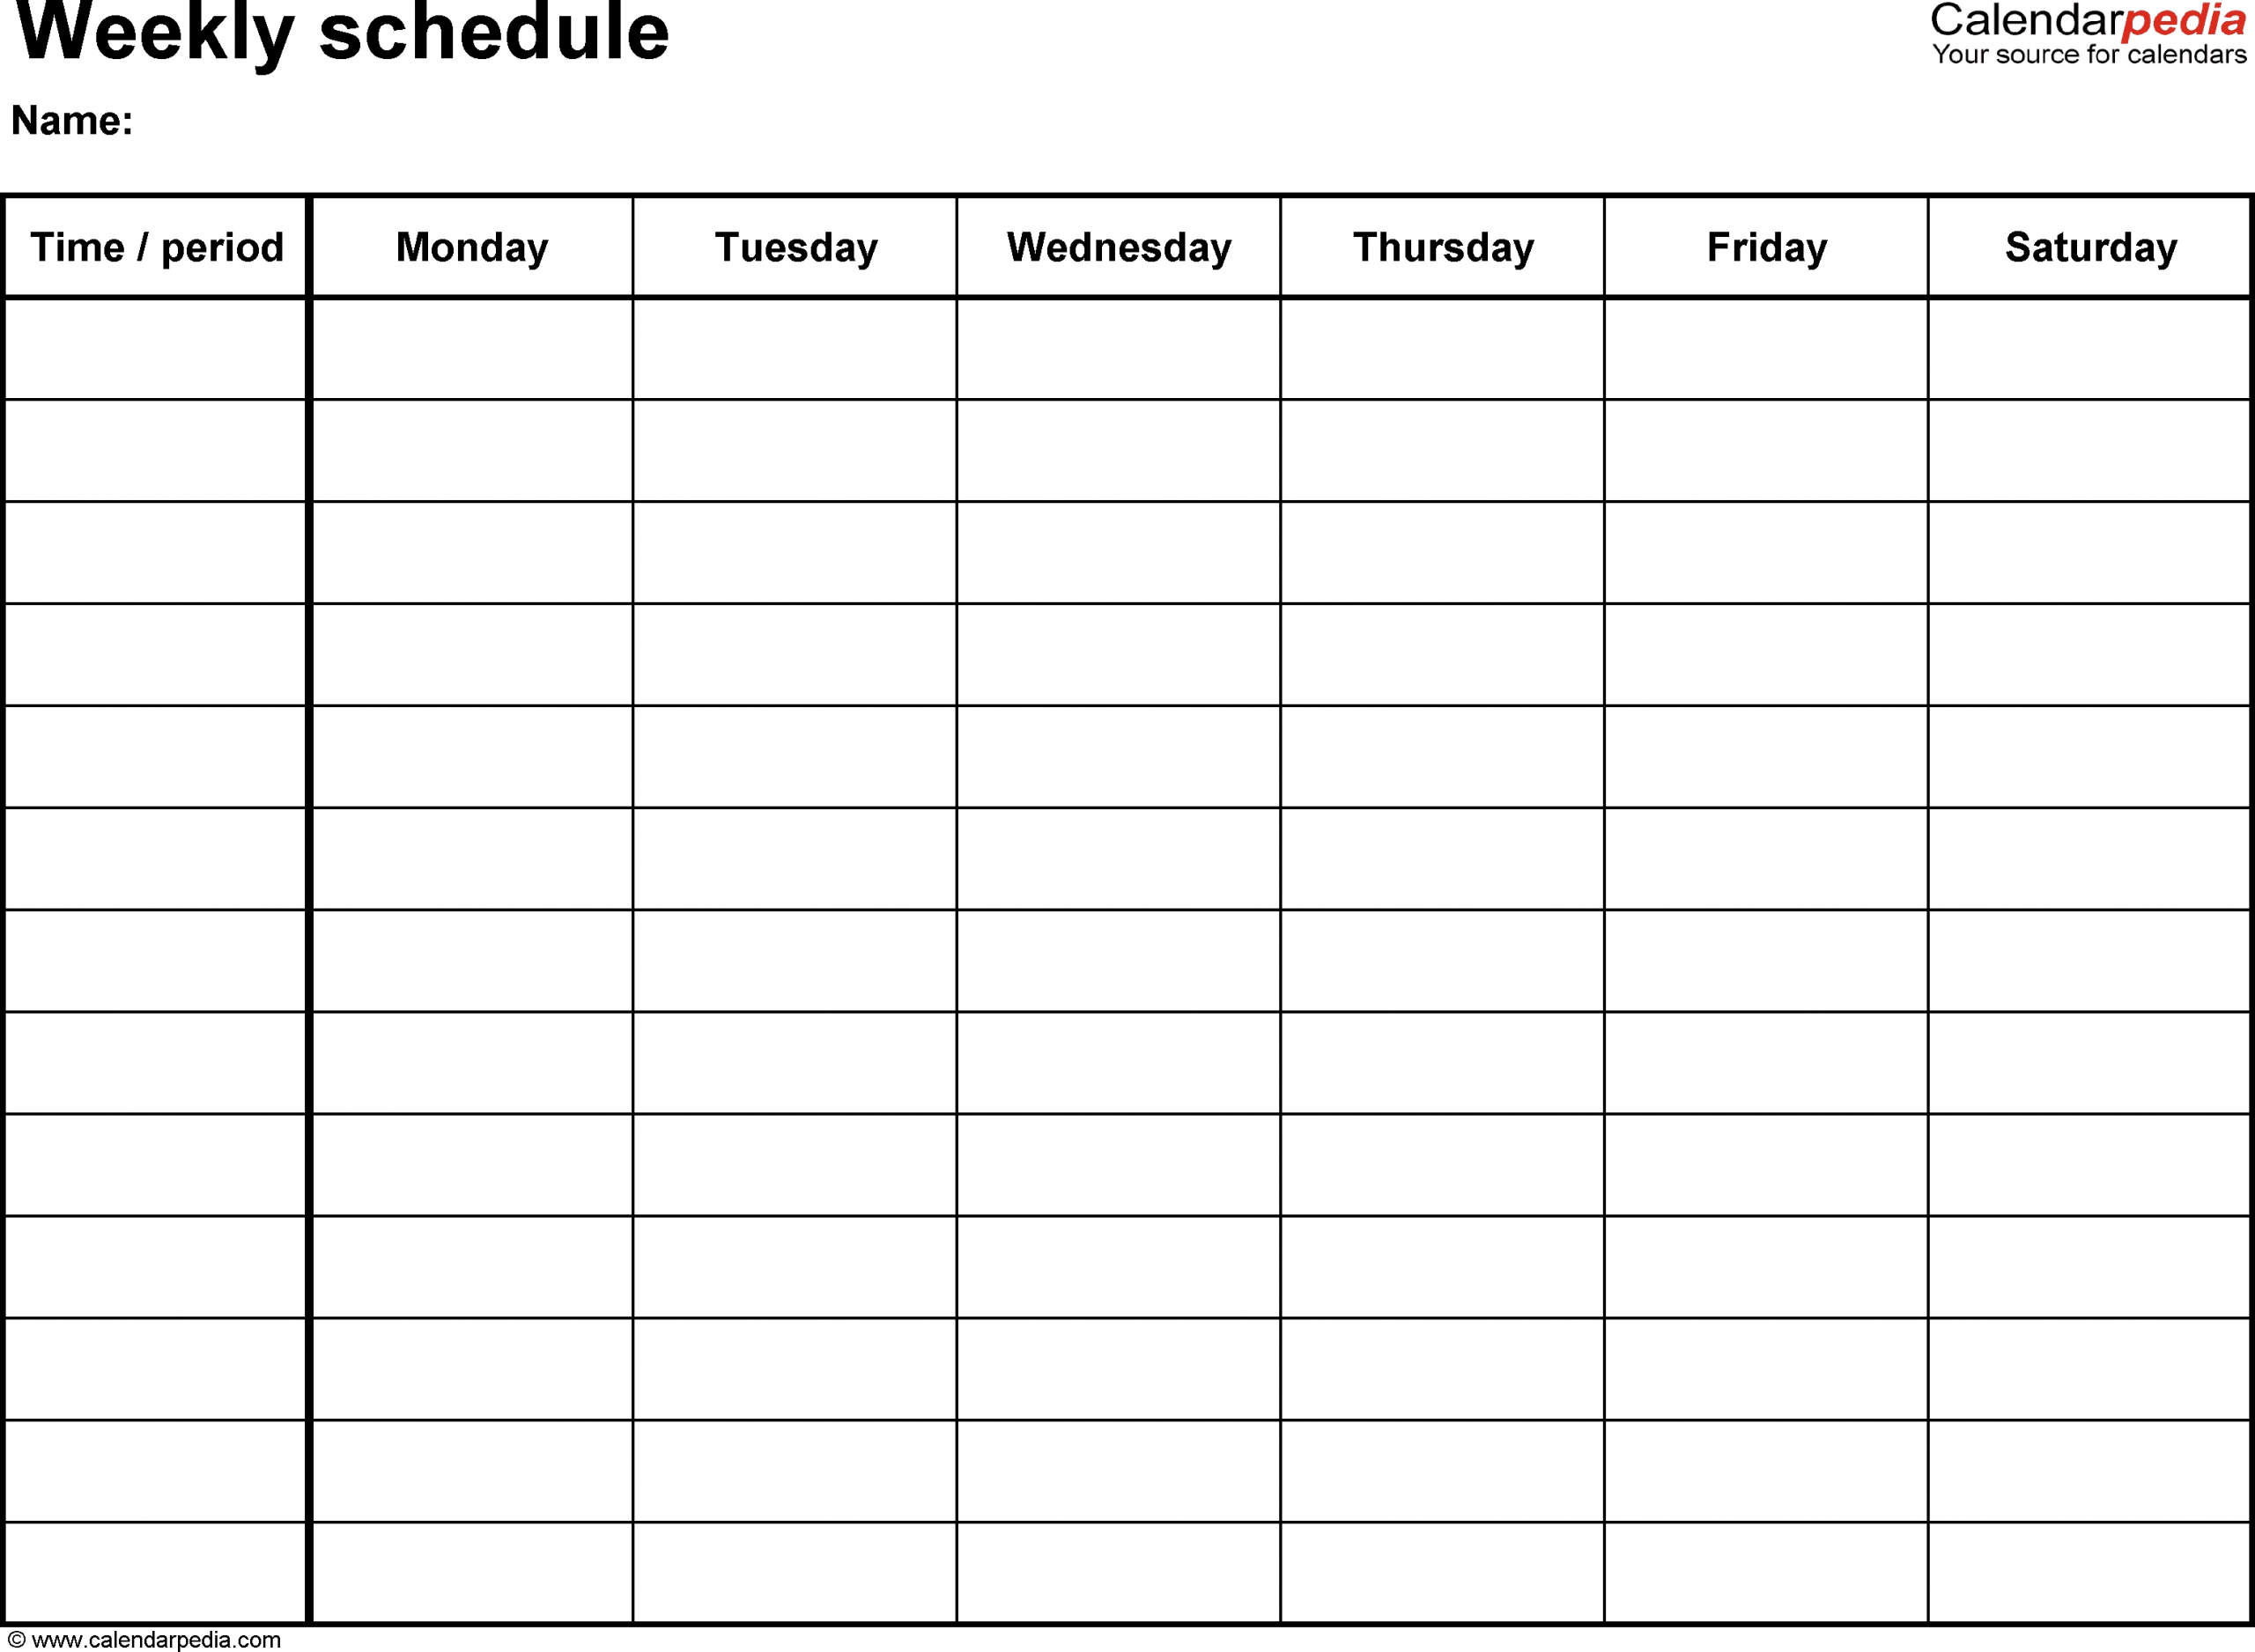 Blank Weekly Calendar To Fill In – Calendar Inspiration Design Online Calendar Fill In